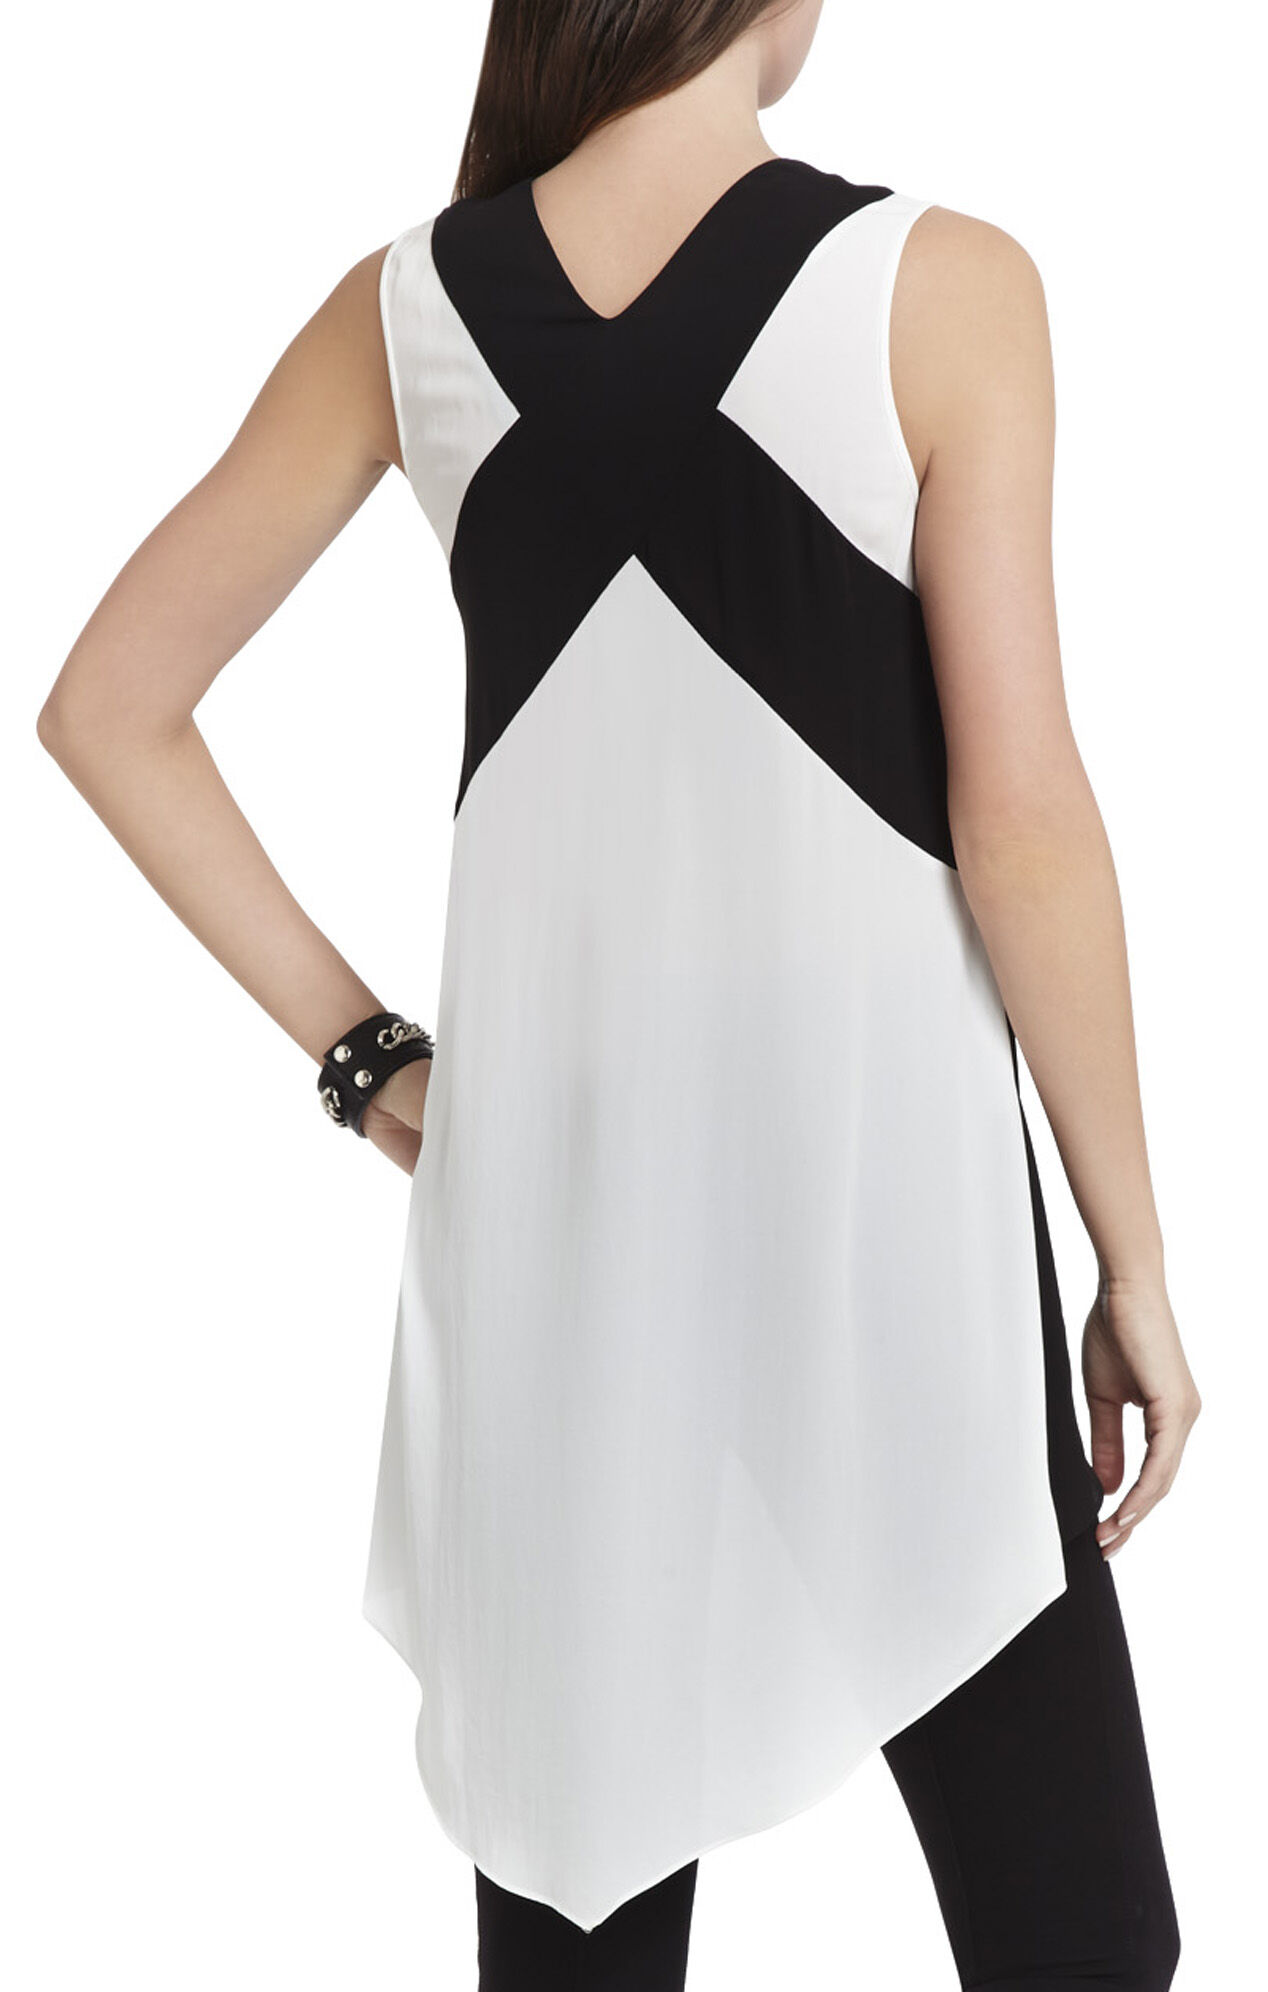 Veronika Sleeveless Color-Blocked Top